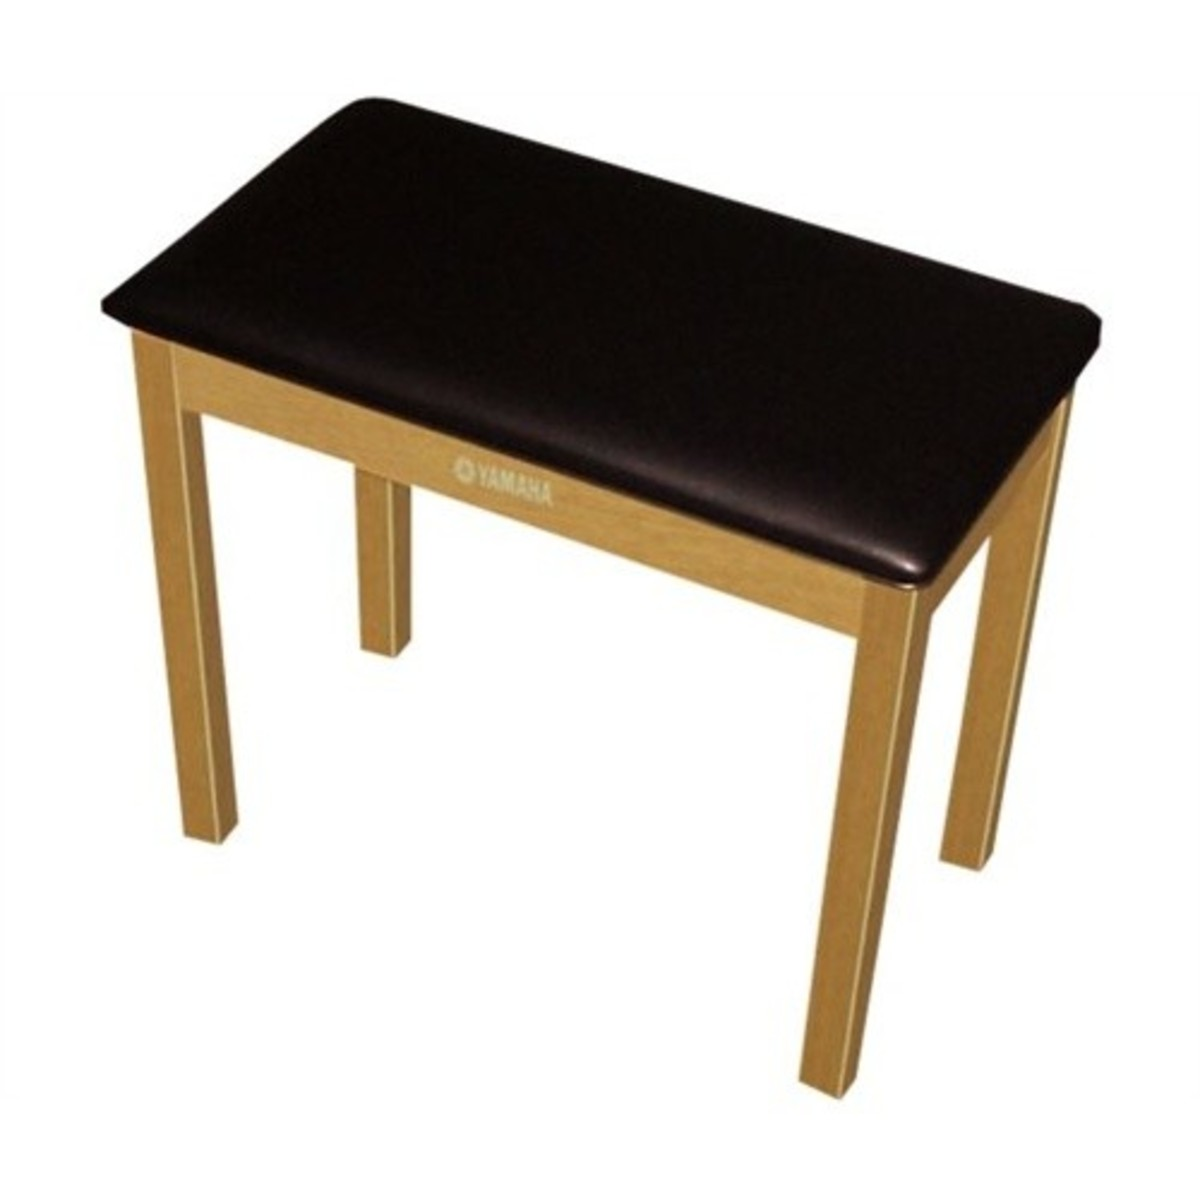 yamaha b1c3 banc de piano cerisier gear4music. Black Bedroom Furniture Sets. Home Design Ideas